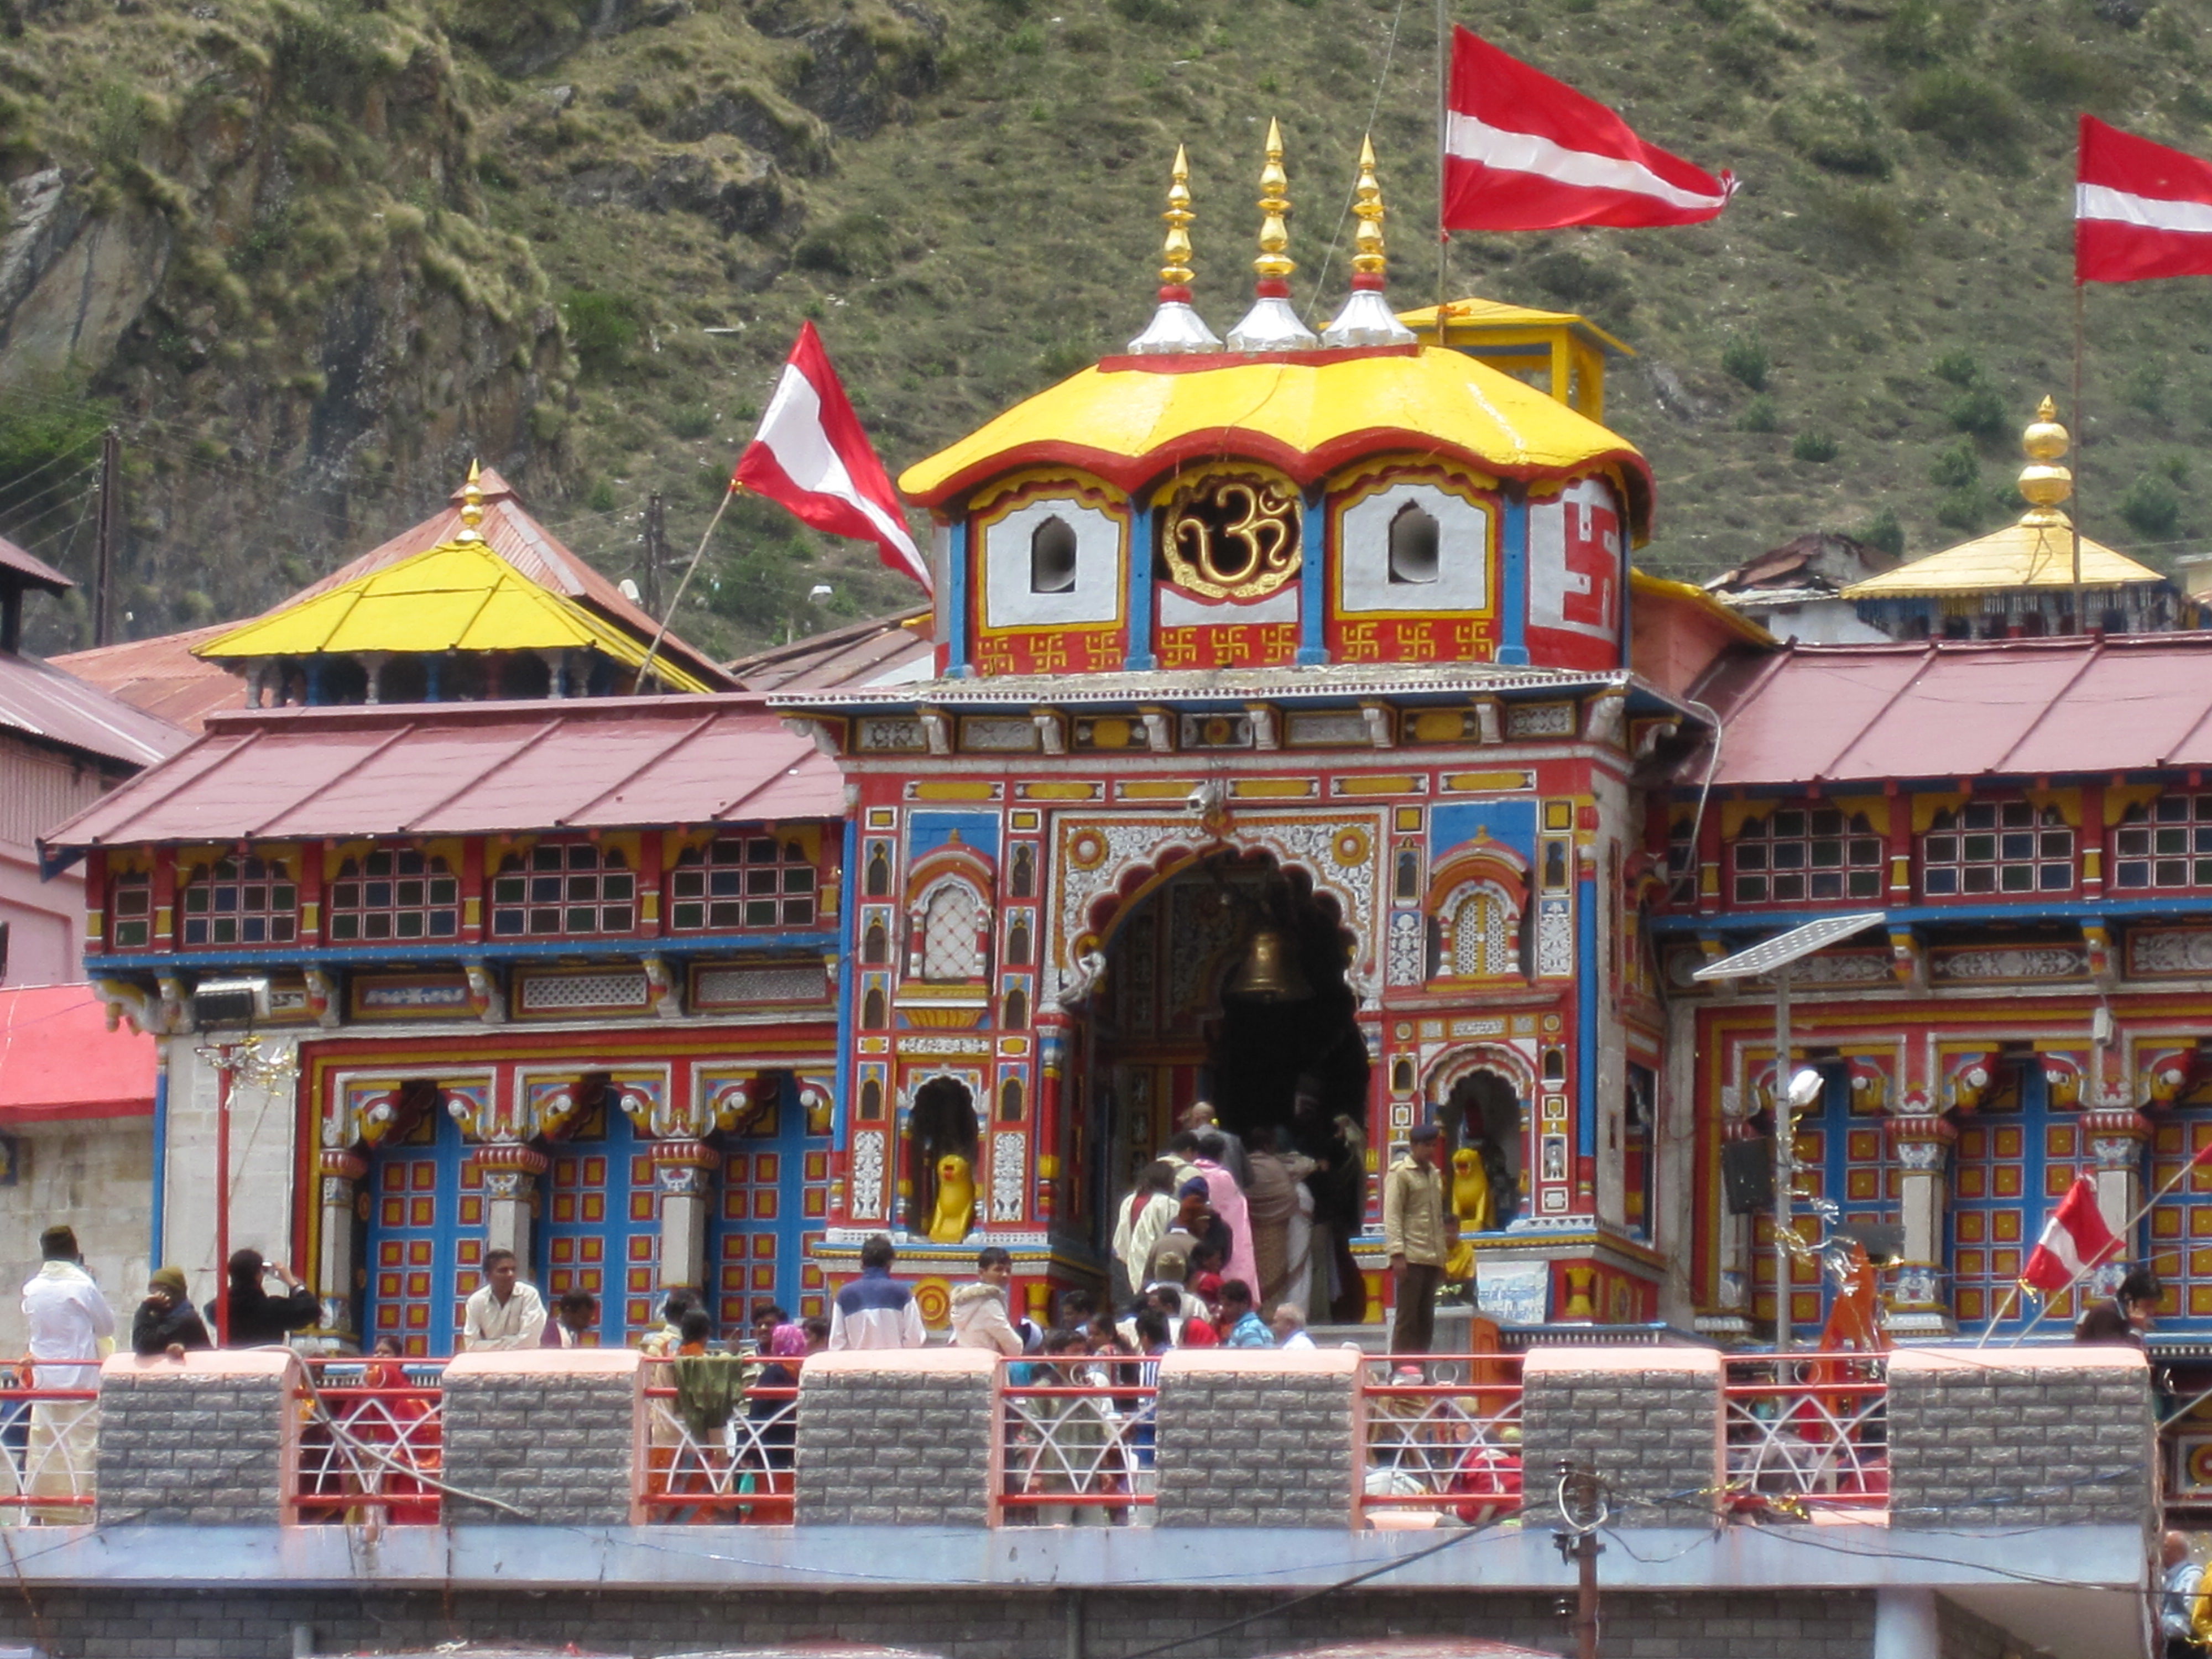 File:Badrinath Temple , Uttarakhand.jpg - Wikimedia Commons